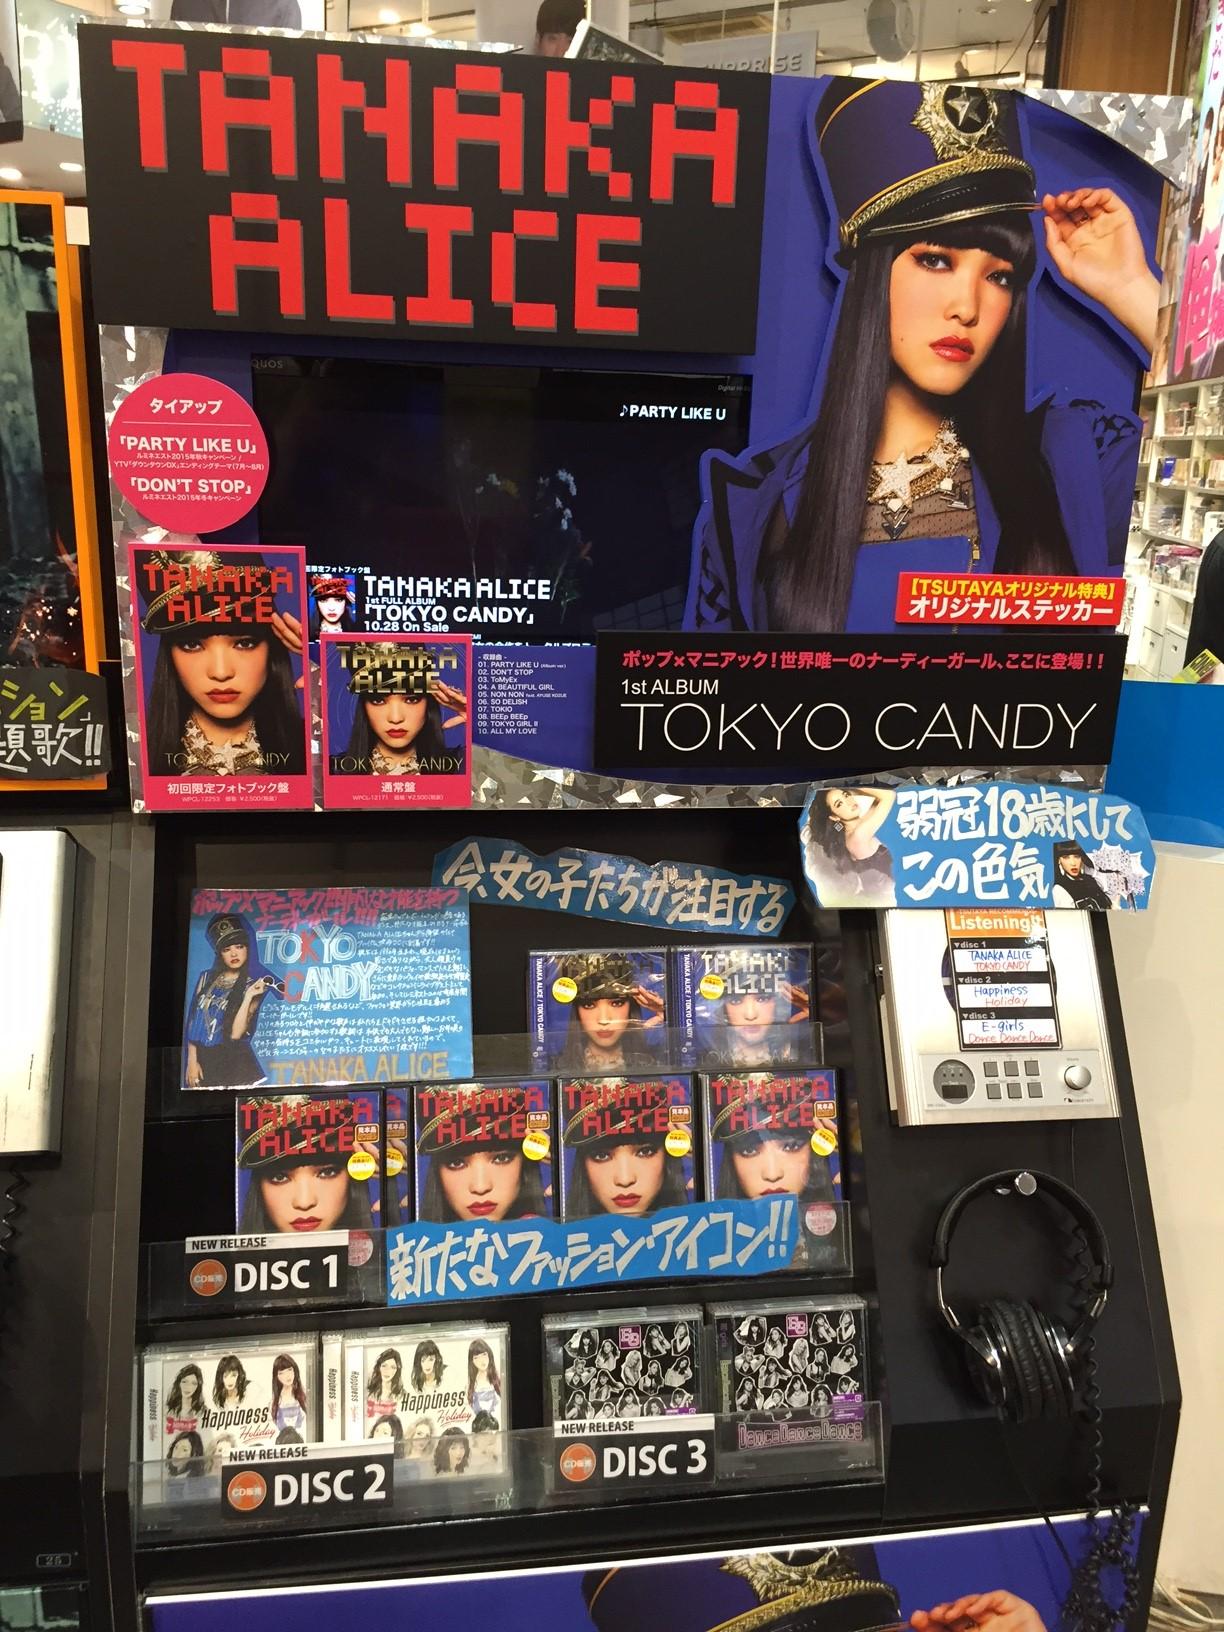 NekoPOP-Tanaka-Alice-Tokyo-Candy-Shibuya-2